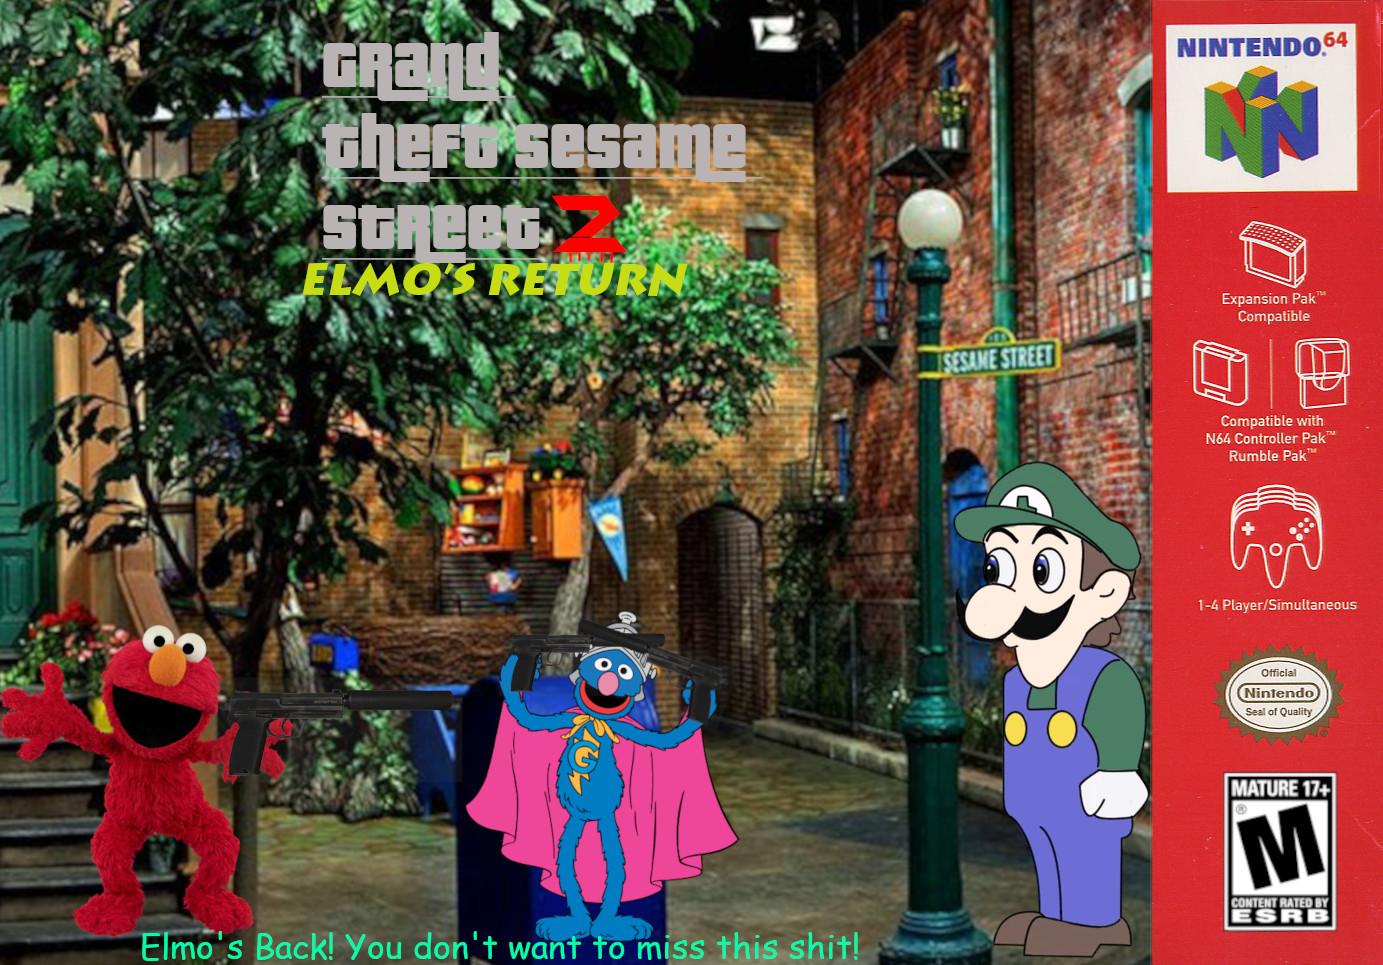 Grand Theft Sesame Street 2: Elmo's Return